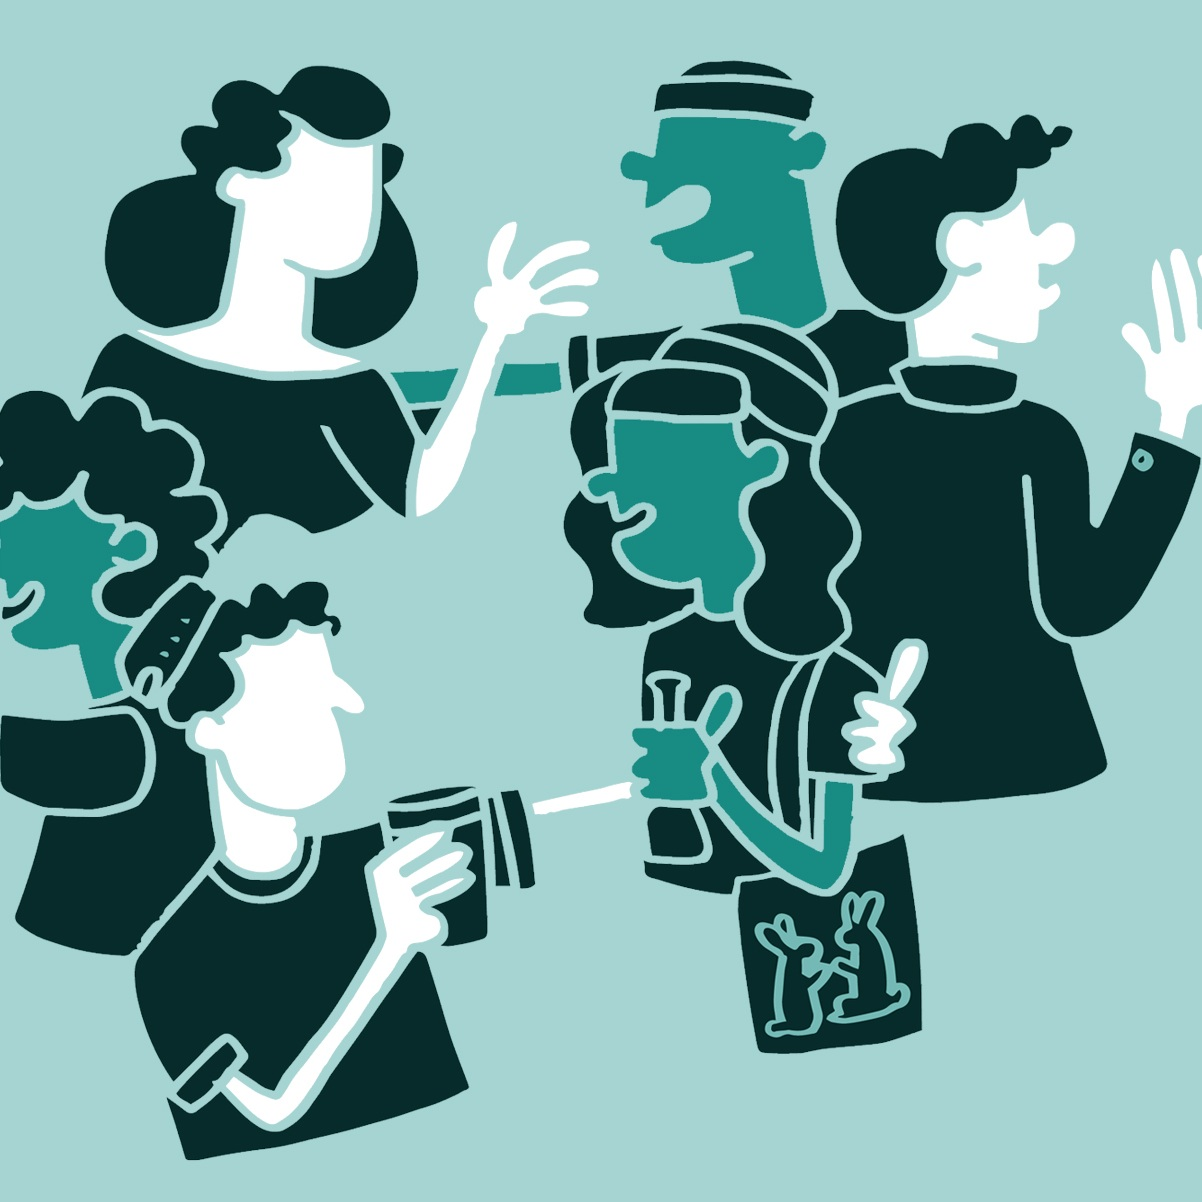 NorwichAOI meet-up group -